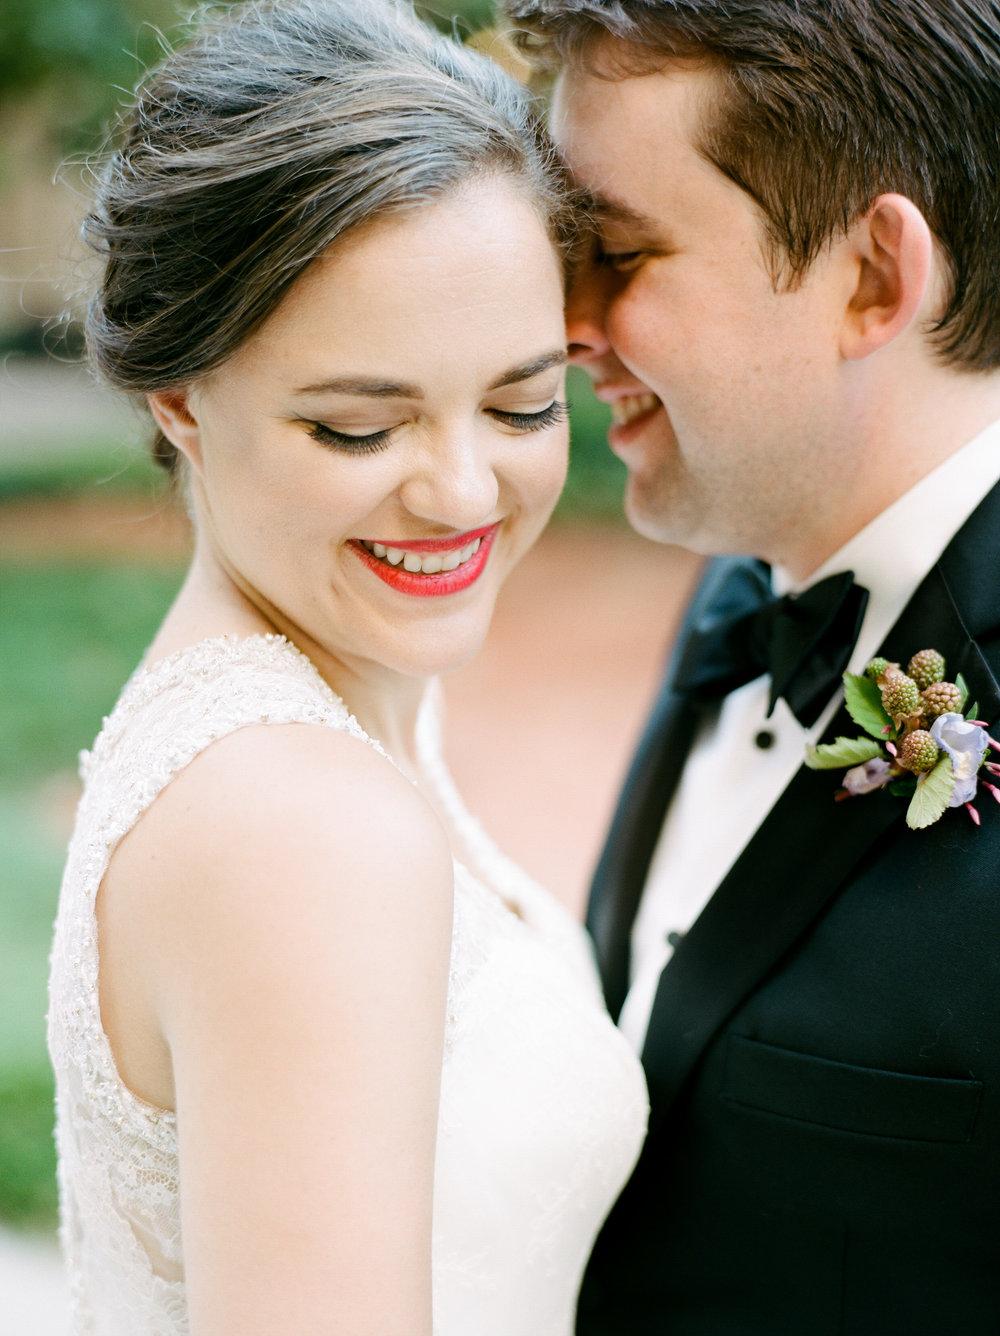 The-Knot-Texas-Fine-Art-Wedding-Film-Destination-Photographer-Houston-Austin-Dallas-New-Orleans-Julia-Ideson-Library-Event-Dana-Josh-Fernandez-Photograph-Top-Best-41.jpg